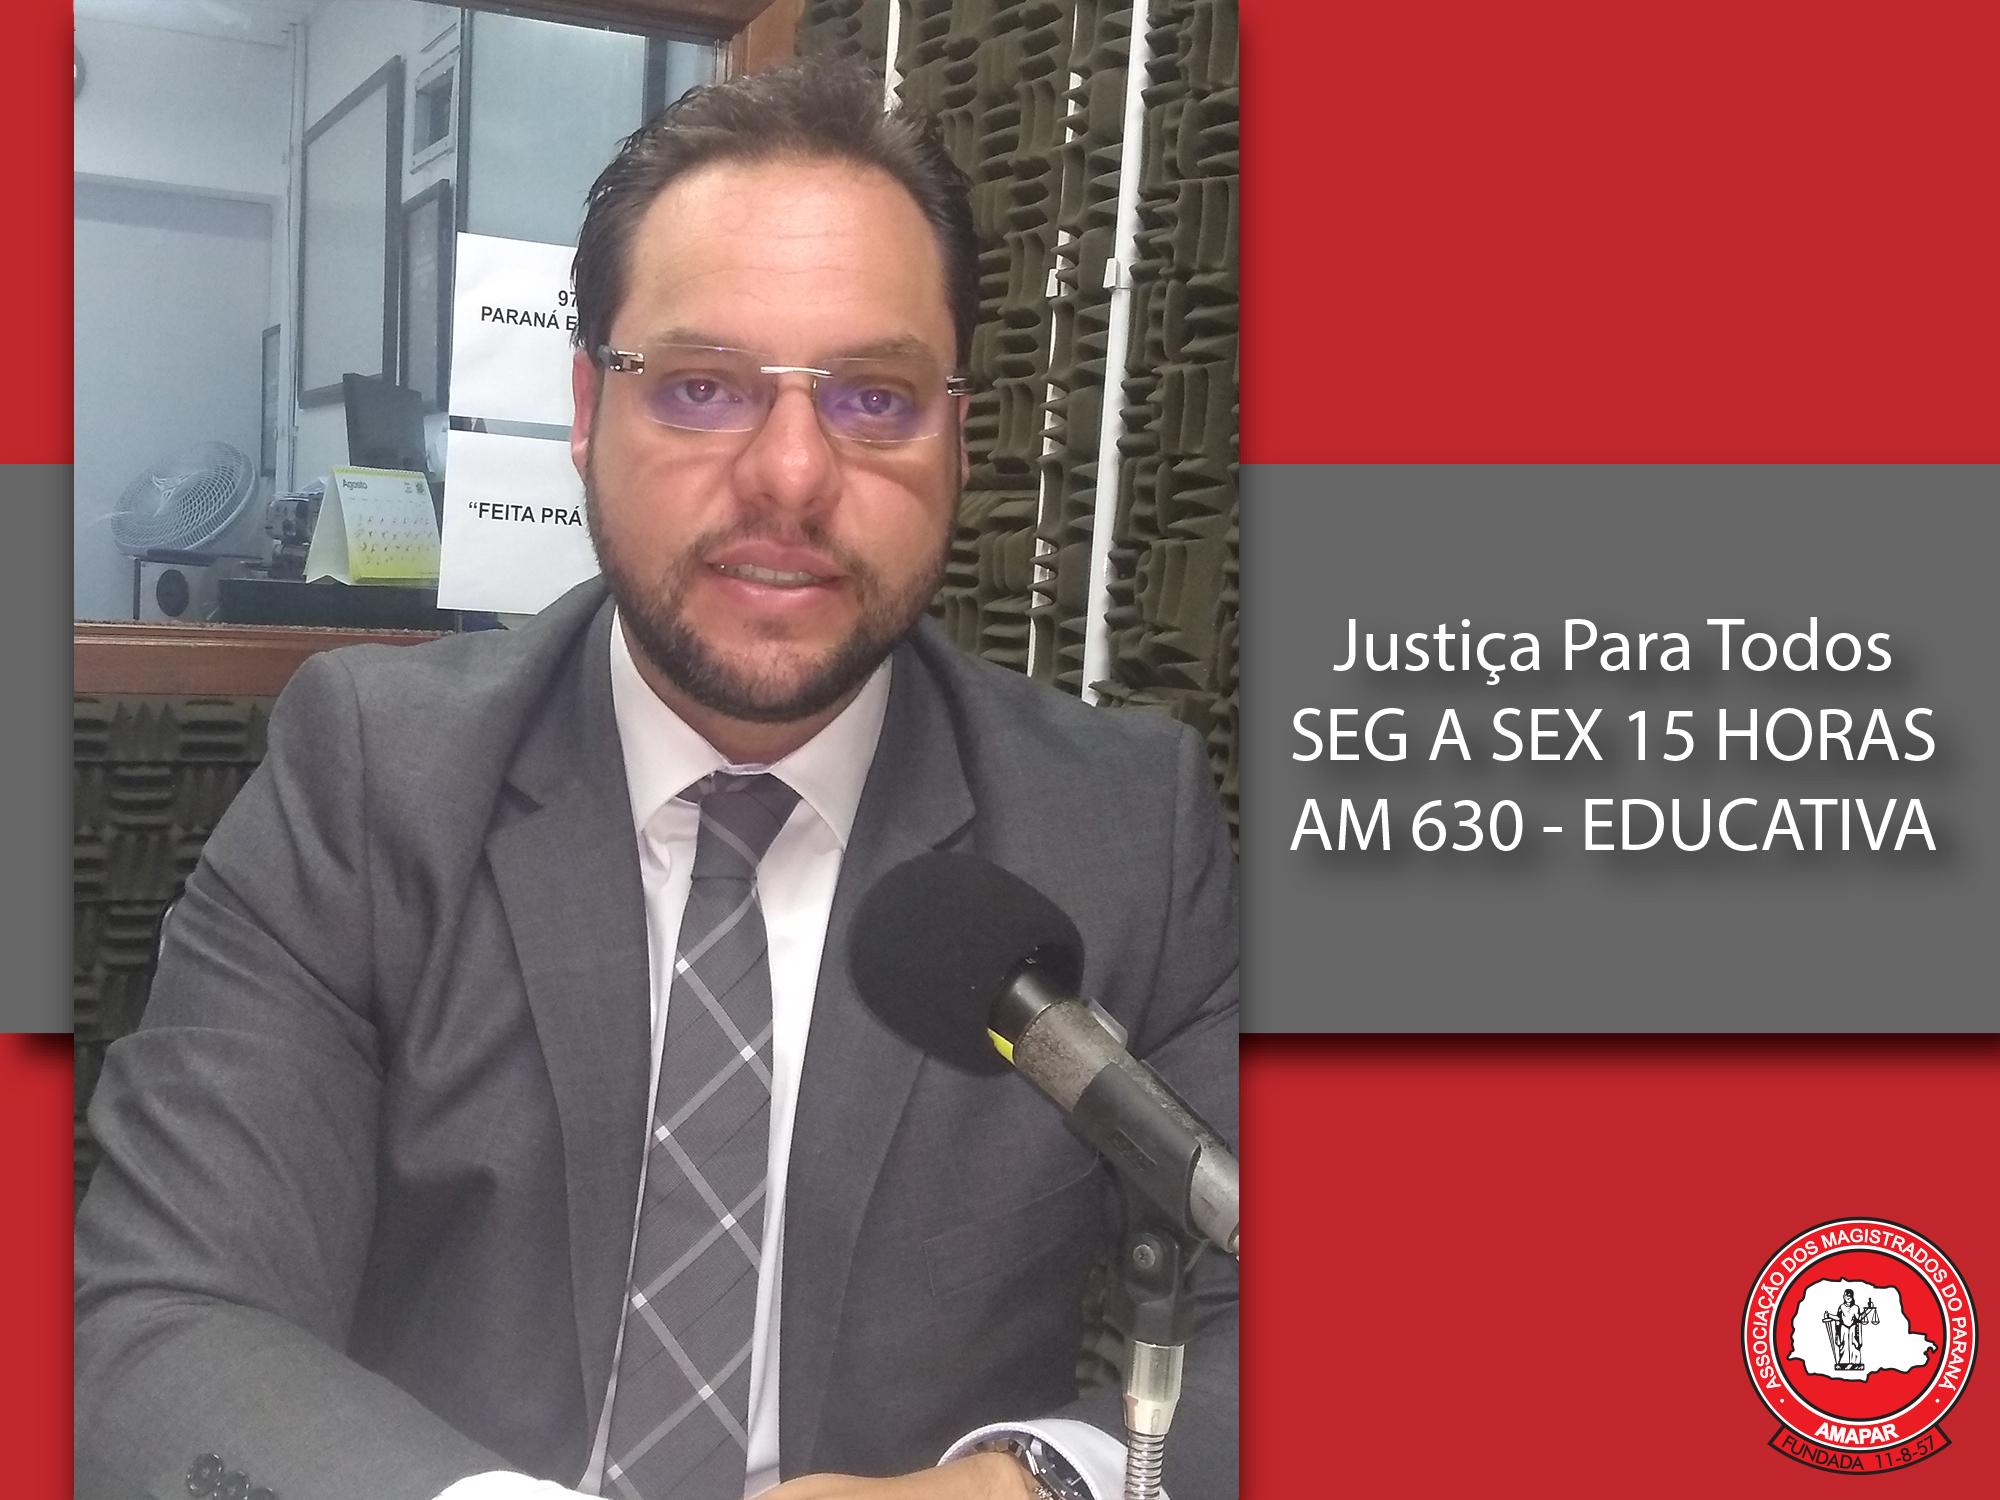 Advogado Rômulo Augusto Araújo Bronzel traz esclarecimentos sobre o Direito Empresarial